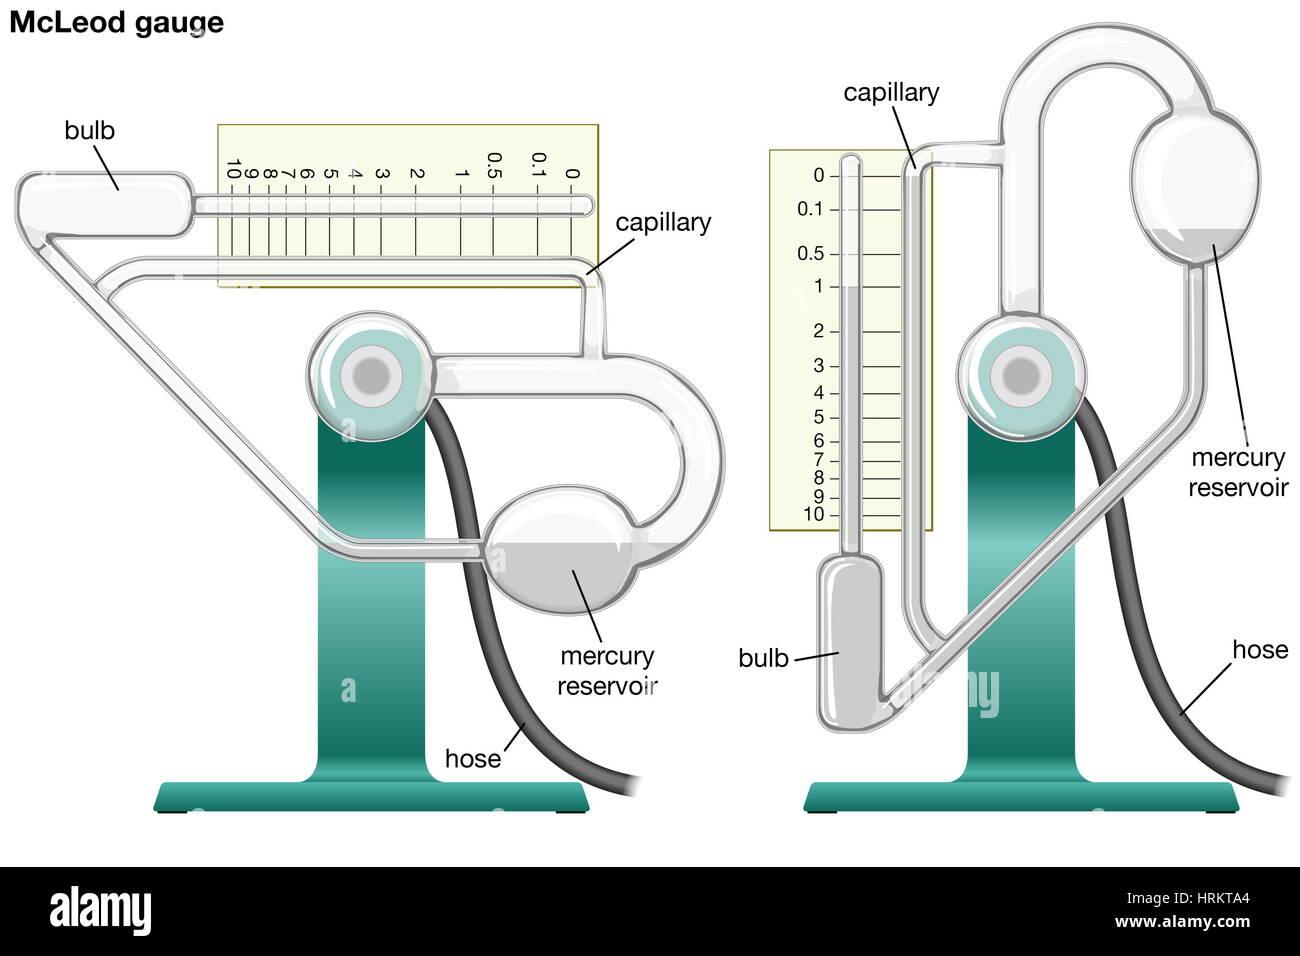 Diagram of a McLeod gauge. vacuum - Stock Image